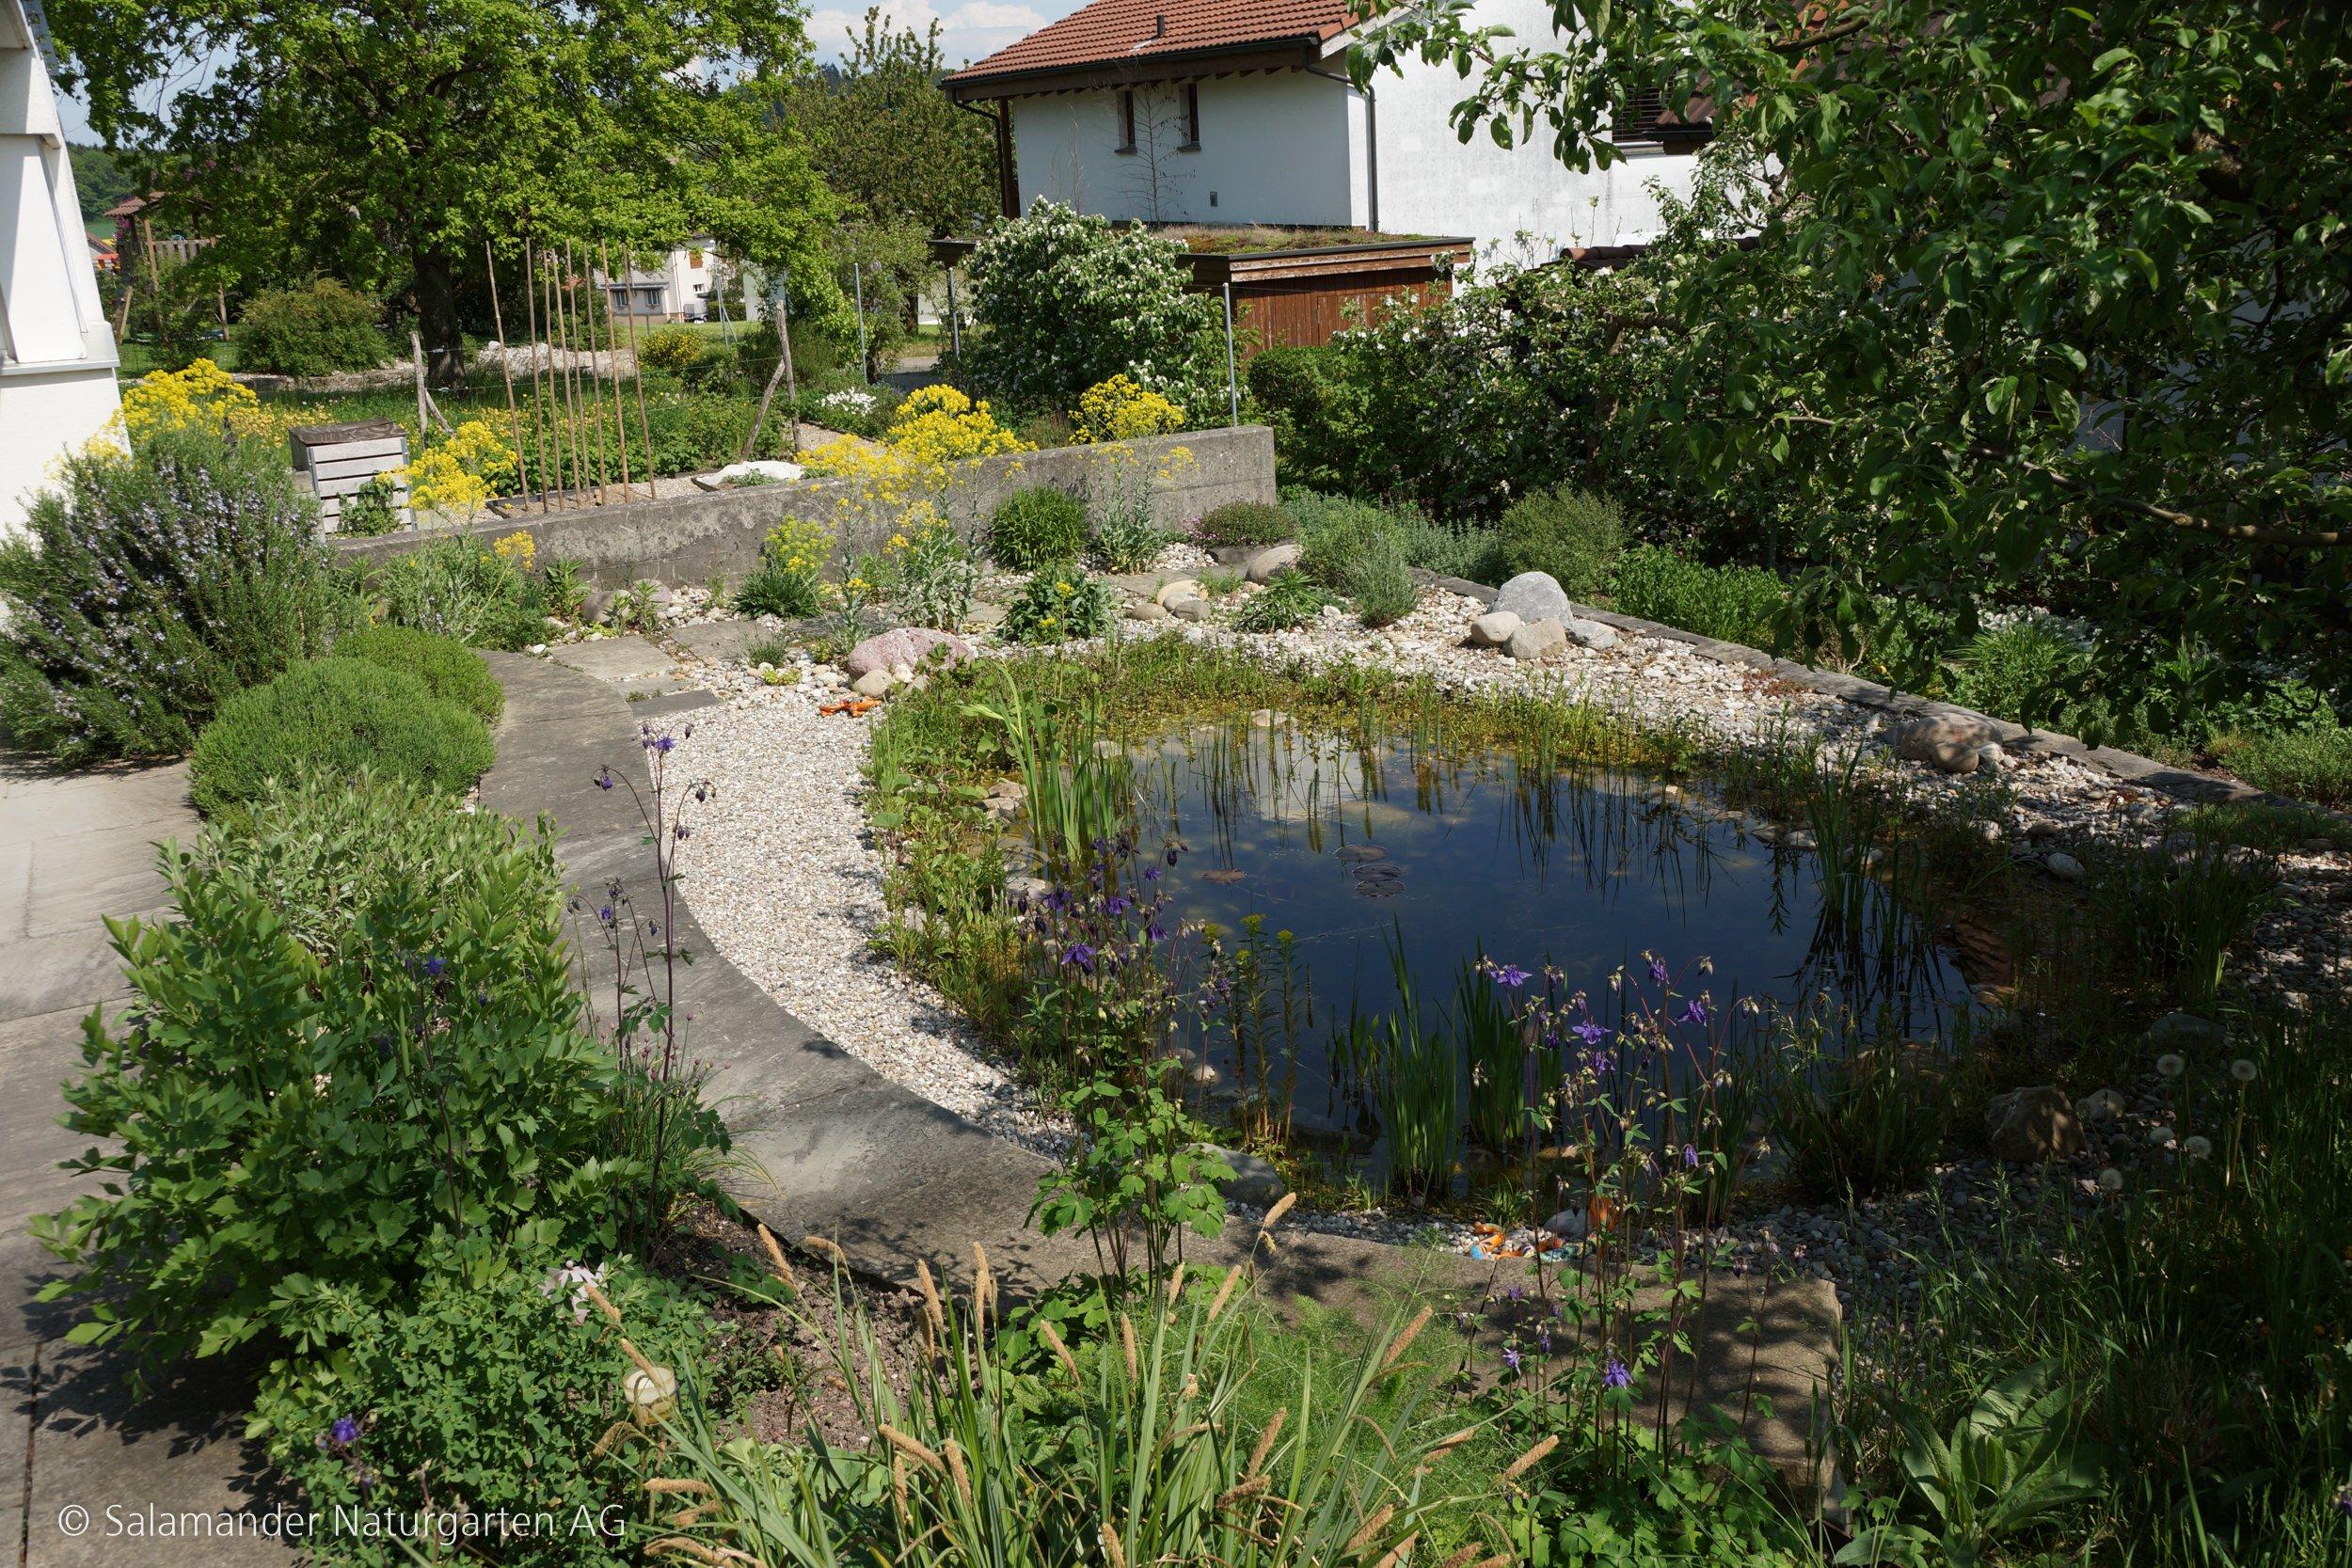 Kleinstrukturen Für Fledermäuse Salamander Naturgarten Ag